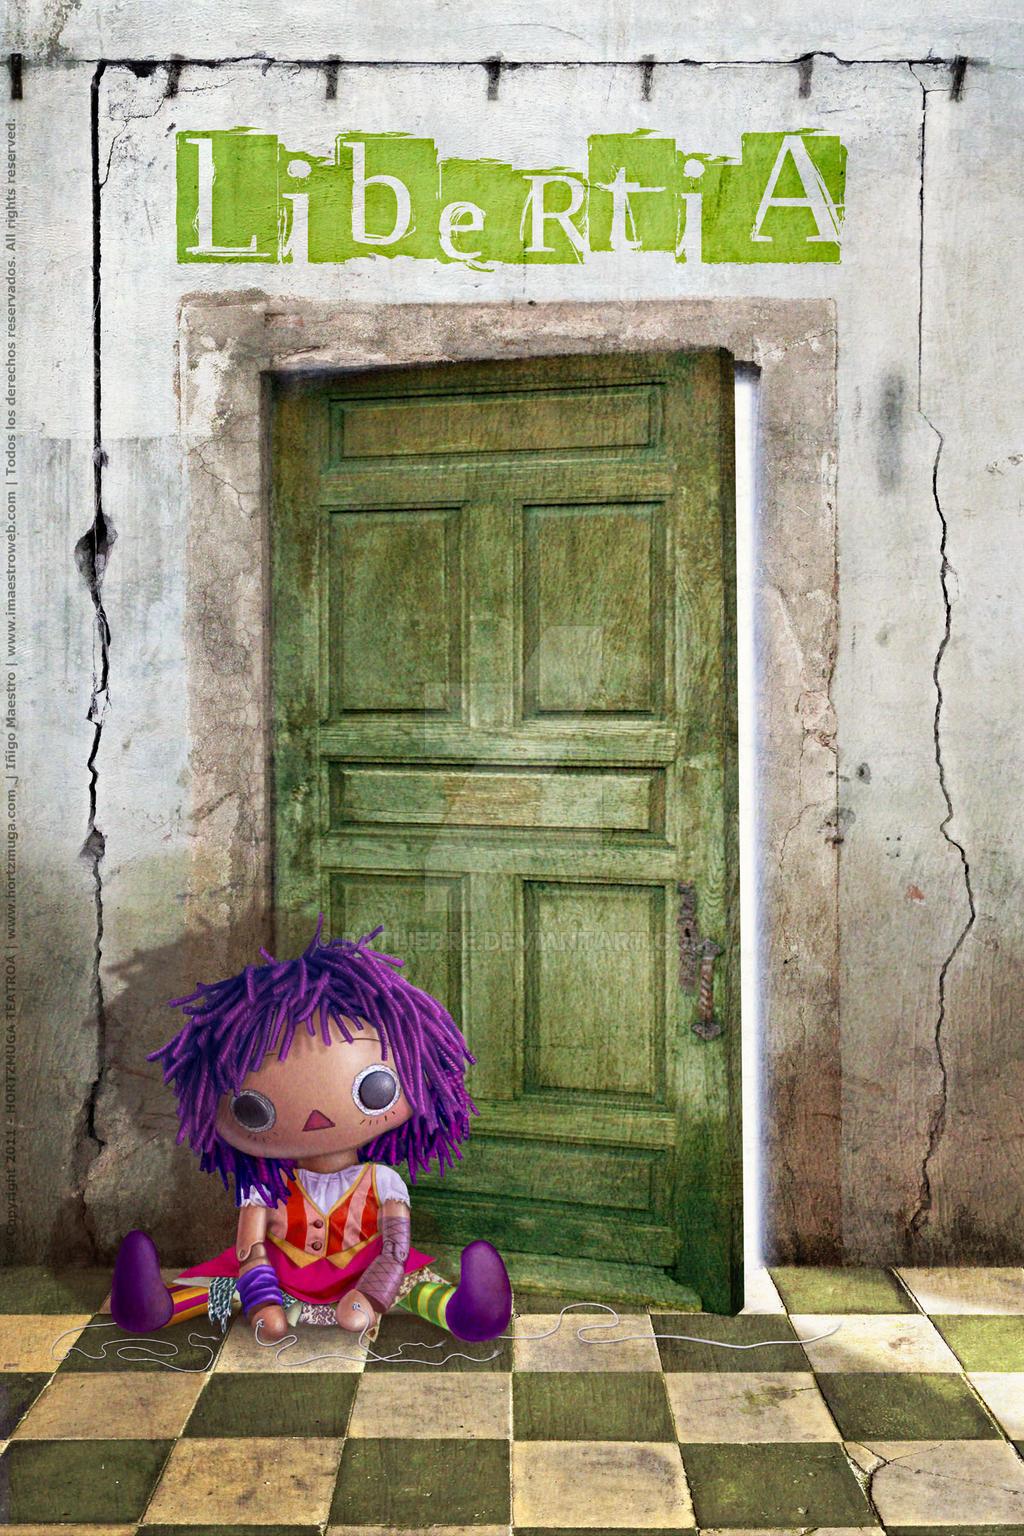 ''Libertia'' Teaser Poster - 2011 by Batliebre